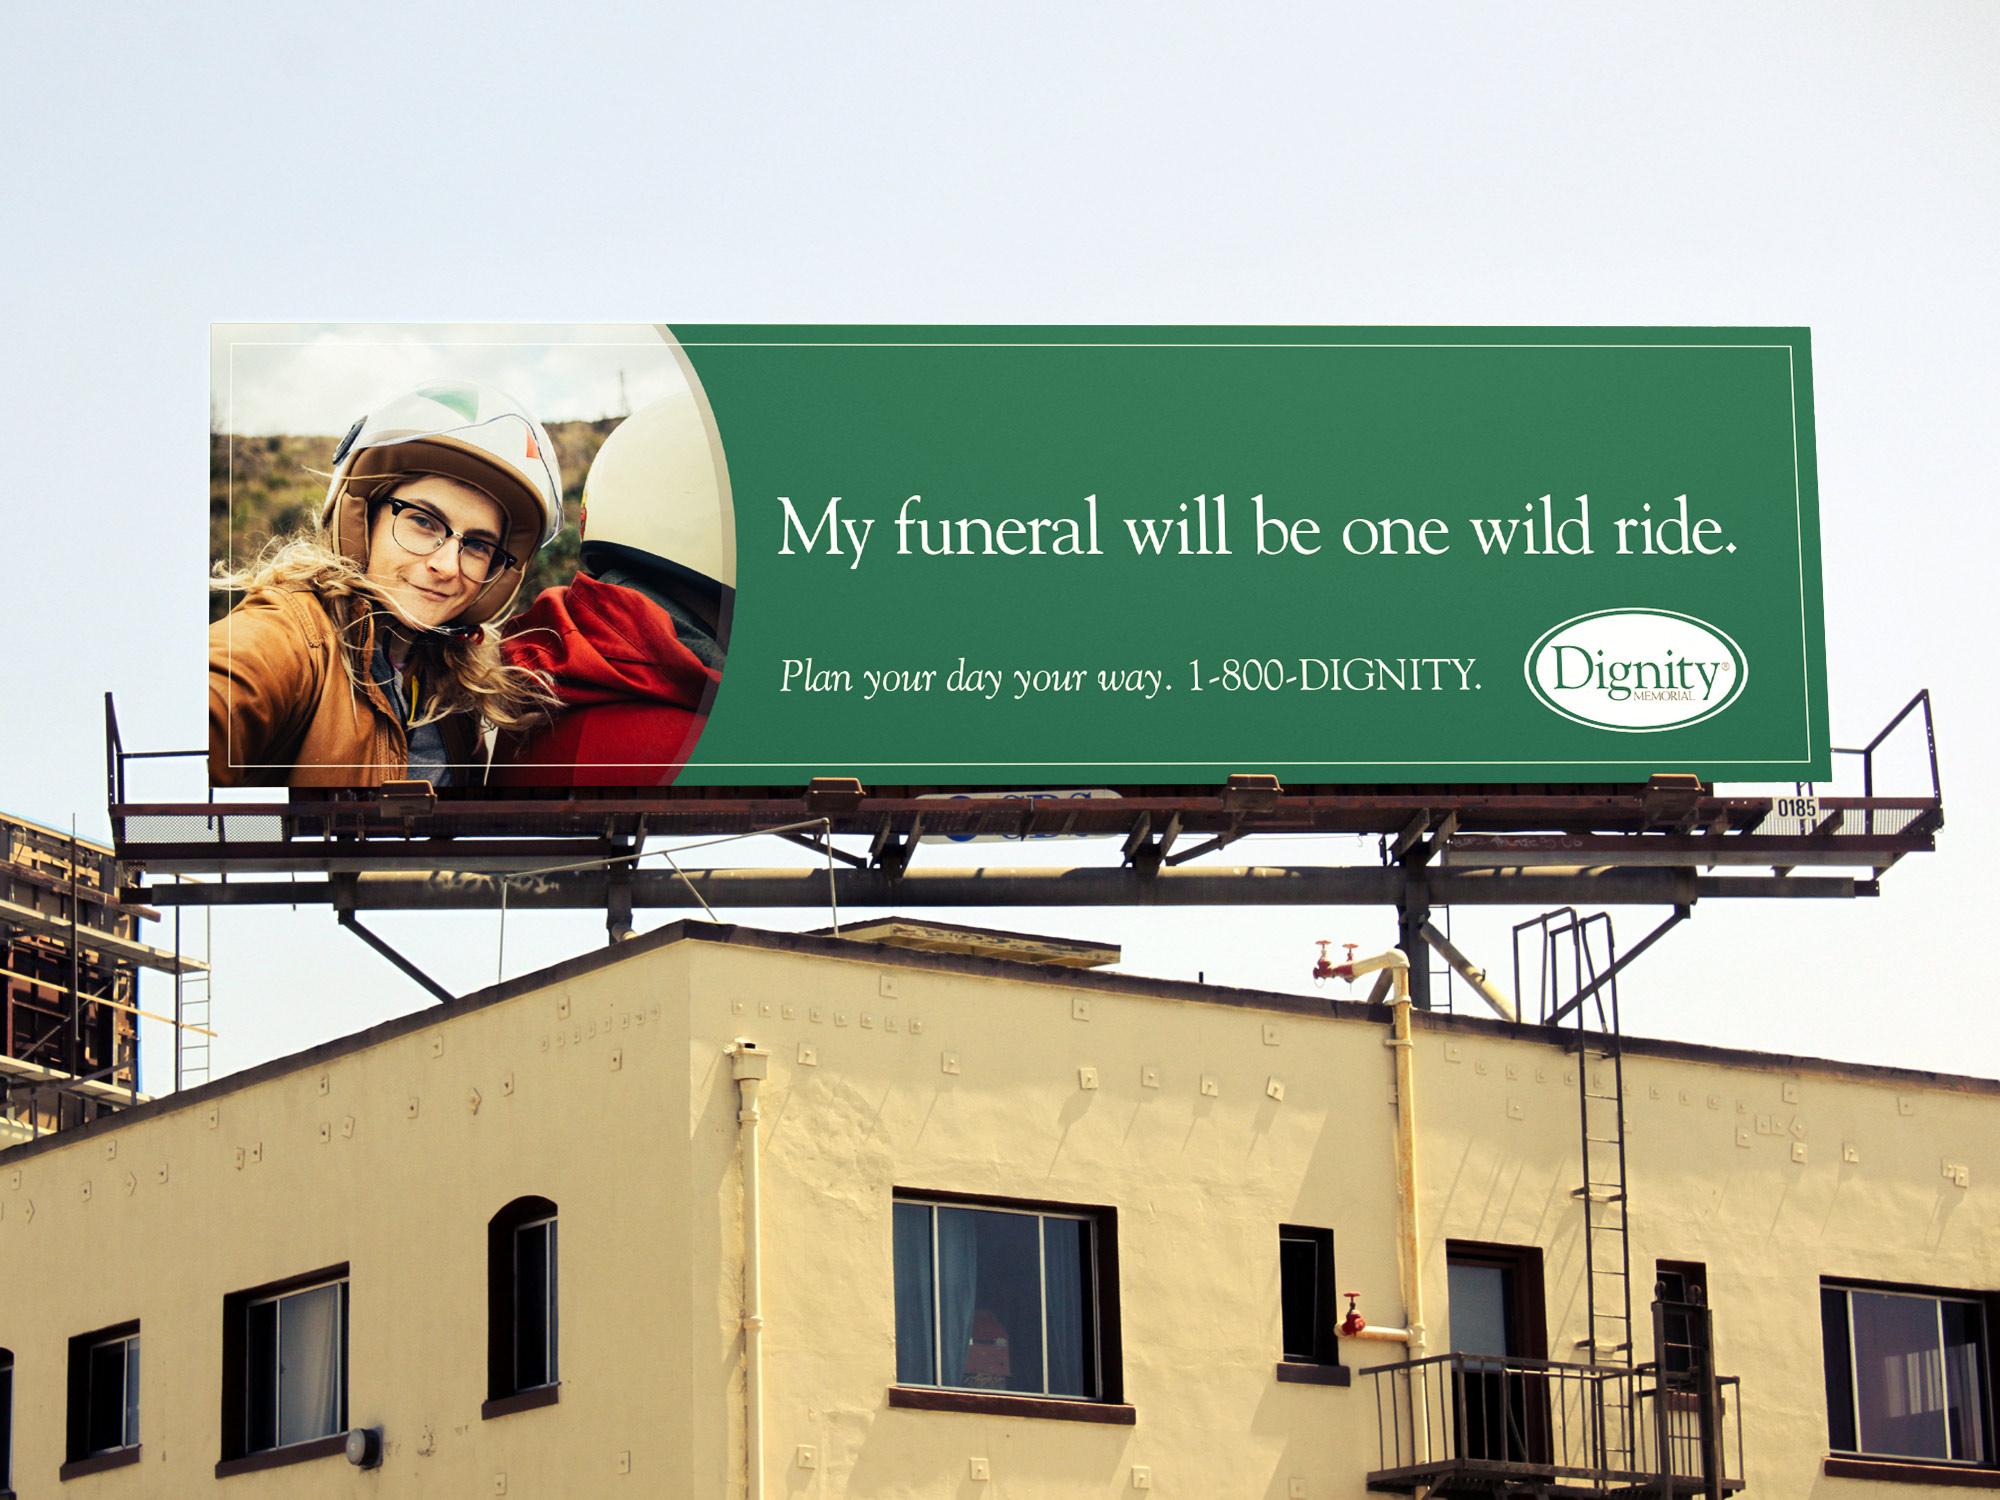 dignitymemorial_billboard.jpg